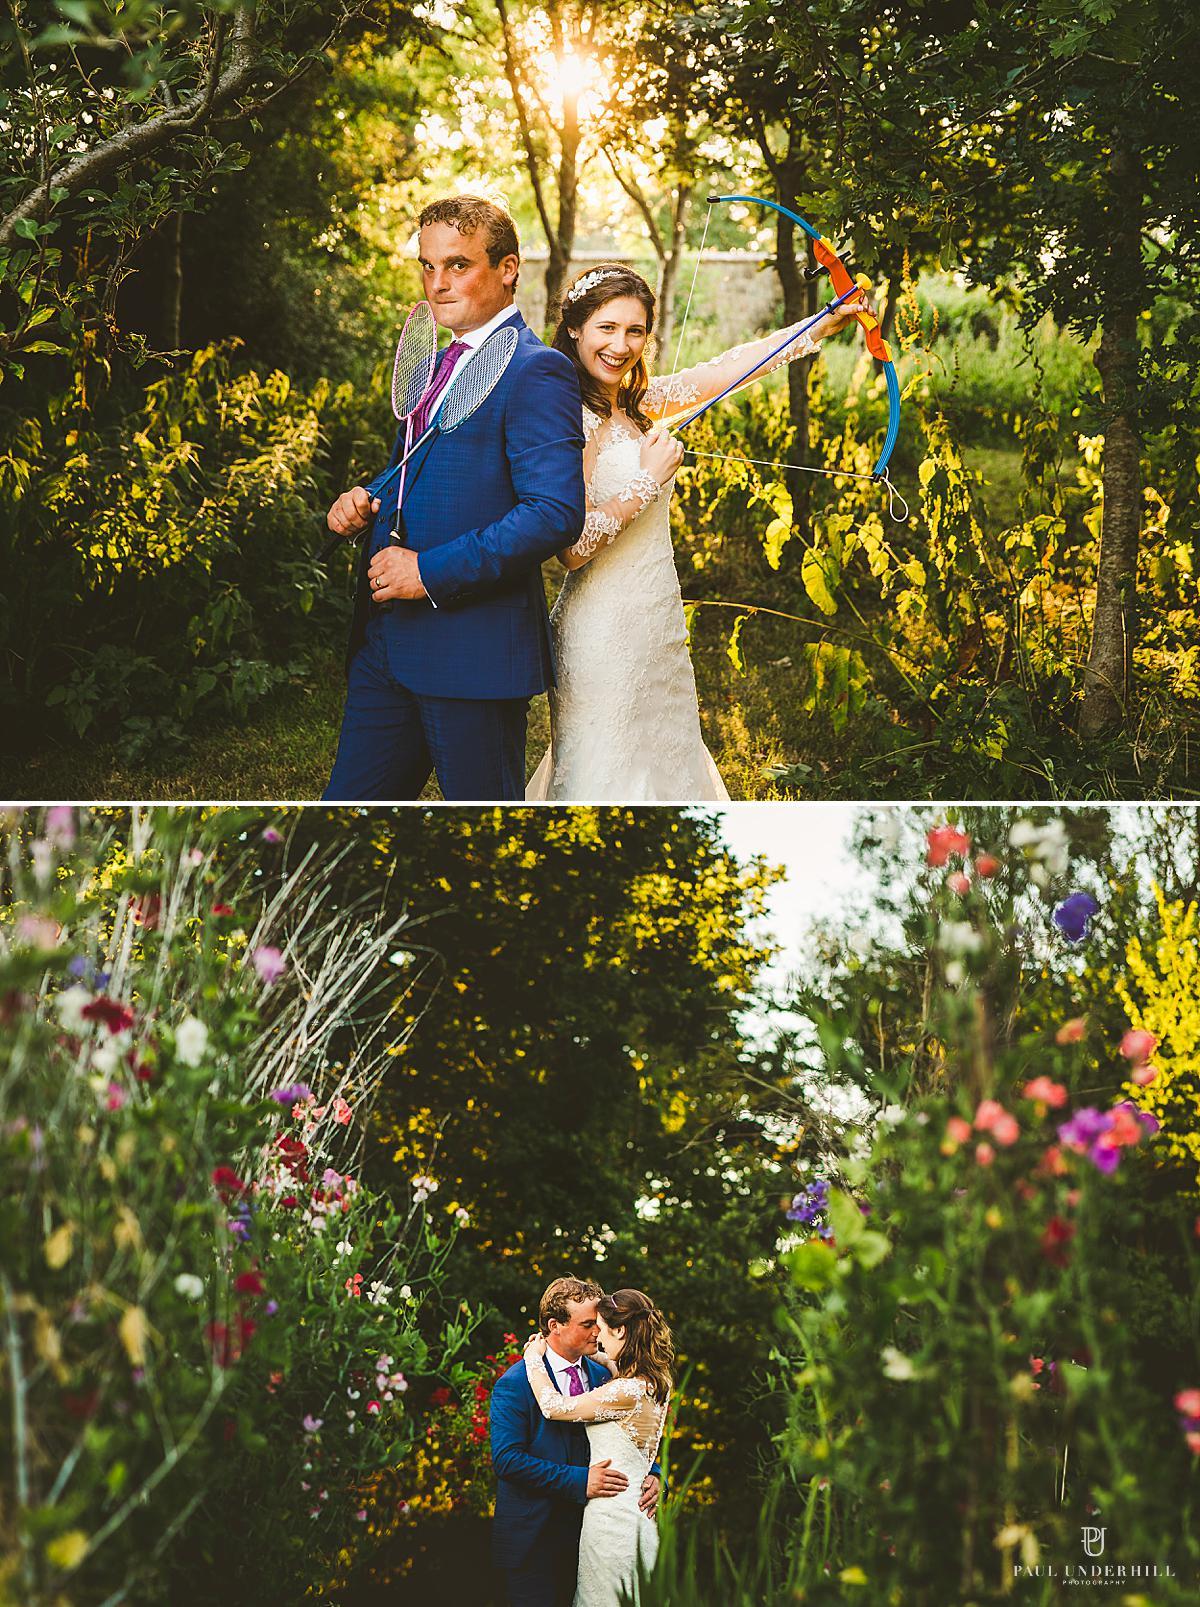 Creative bride groom-portraits Dorset photographer